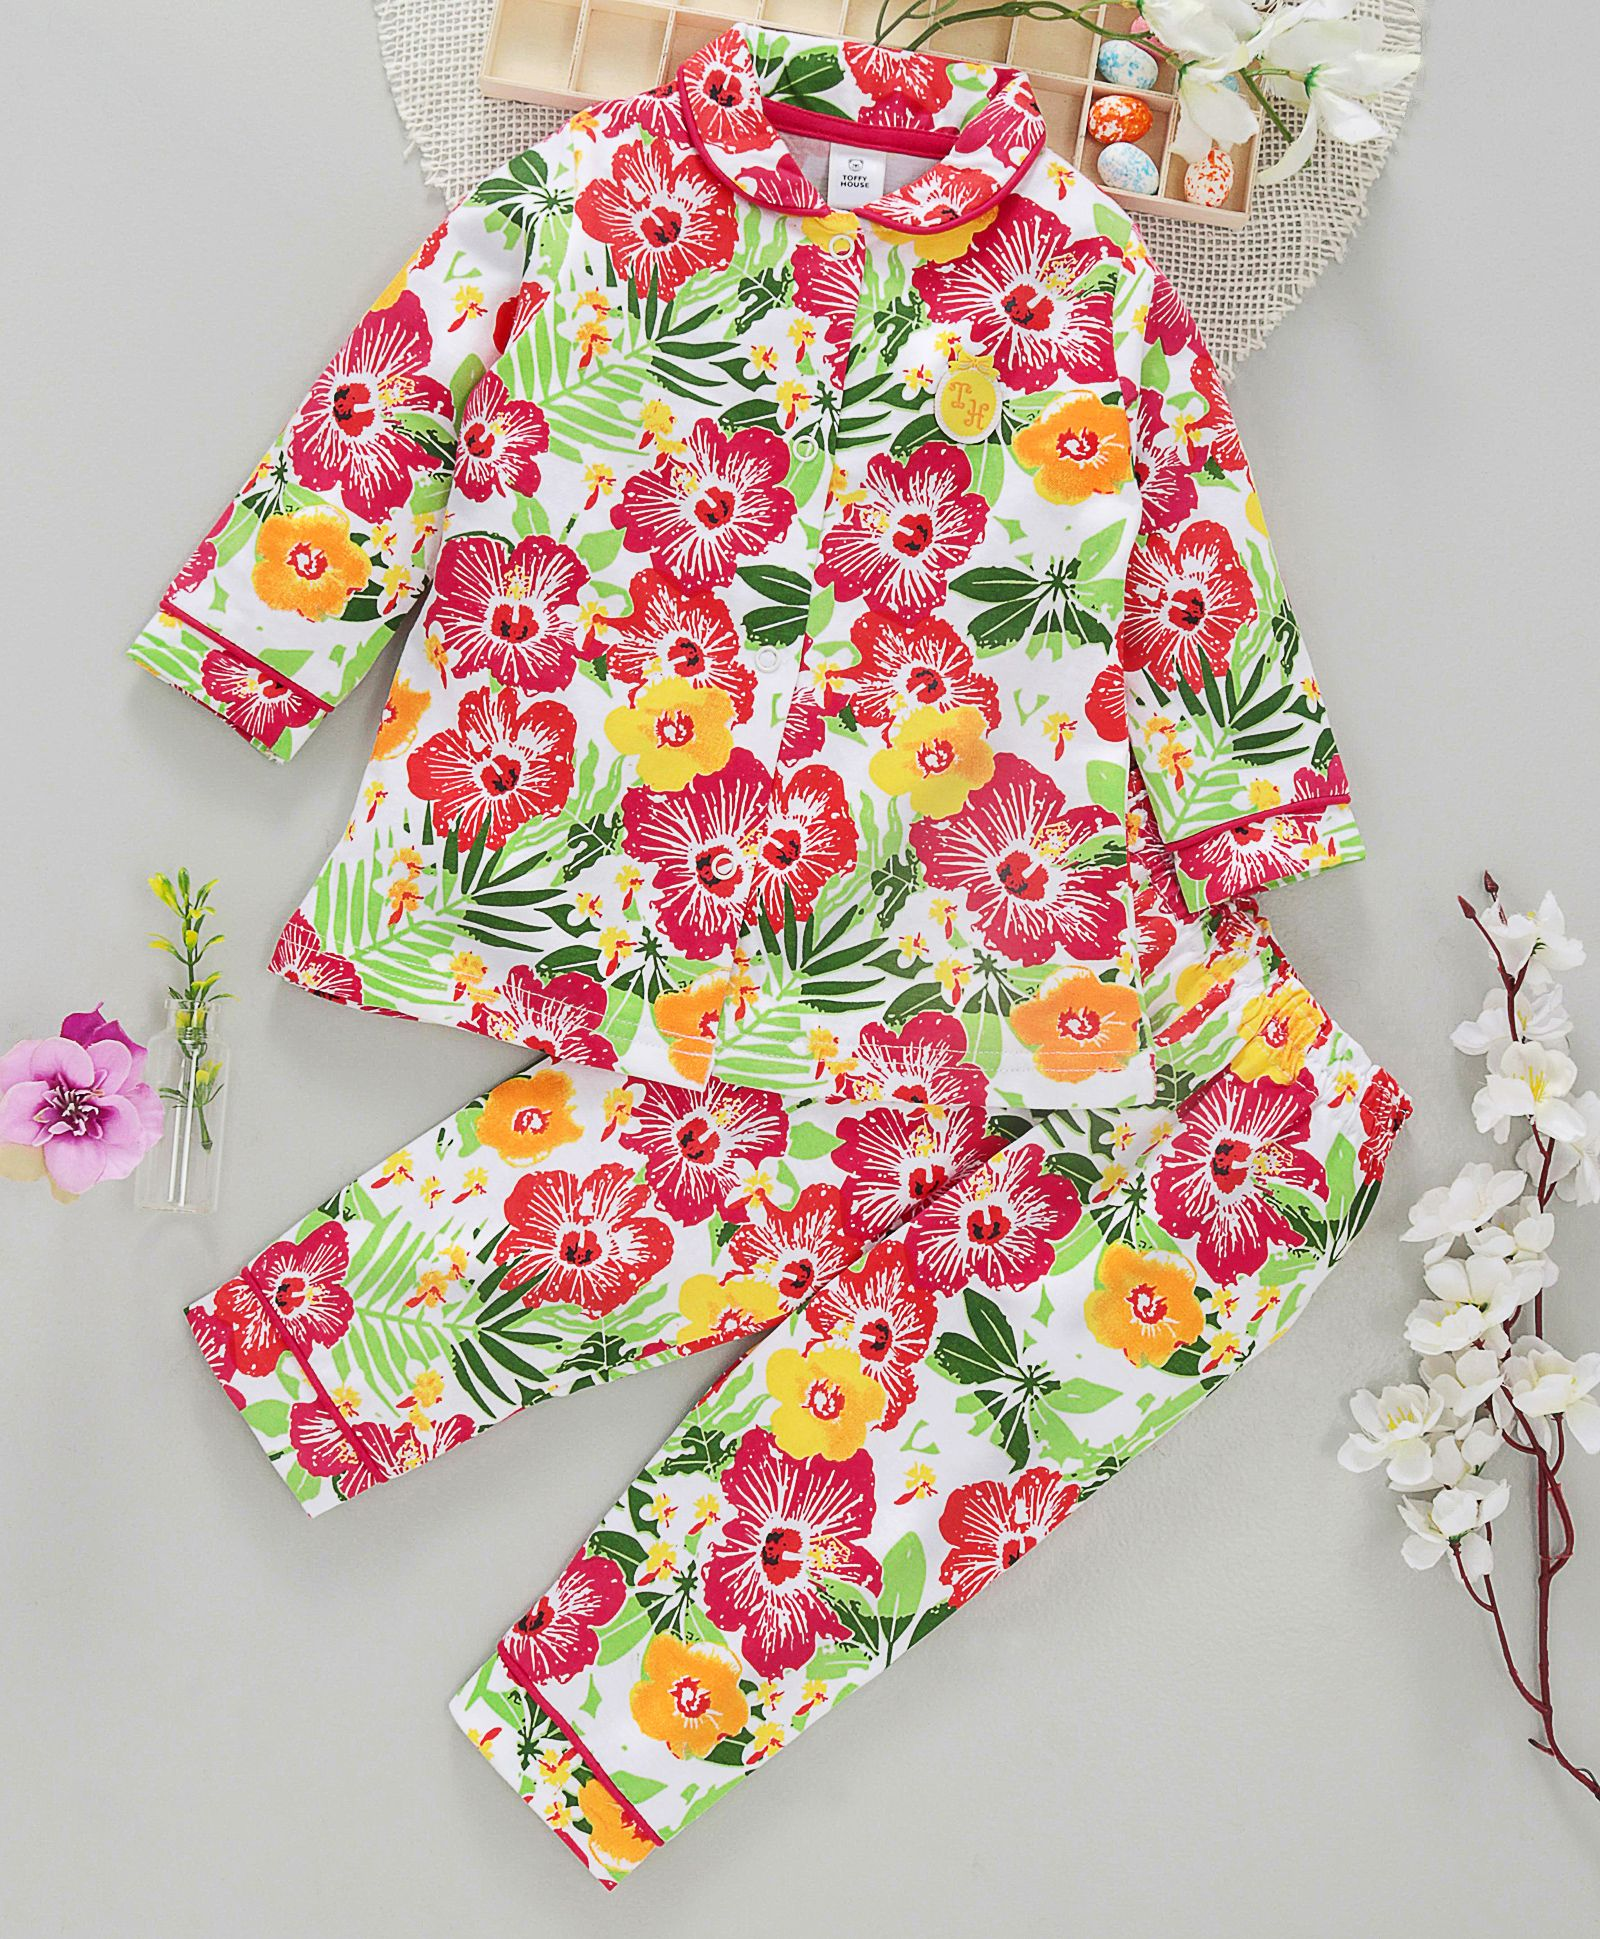 032b8c776 ToffyHouse Peter Pan Collar Neck Night Suit Floral Print - Multicolour